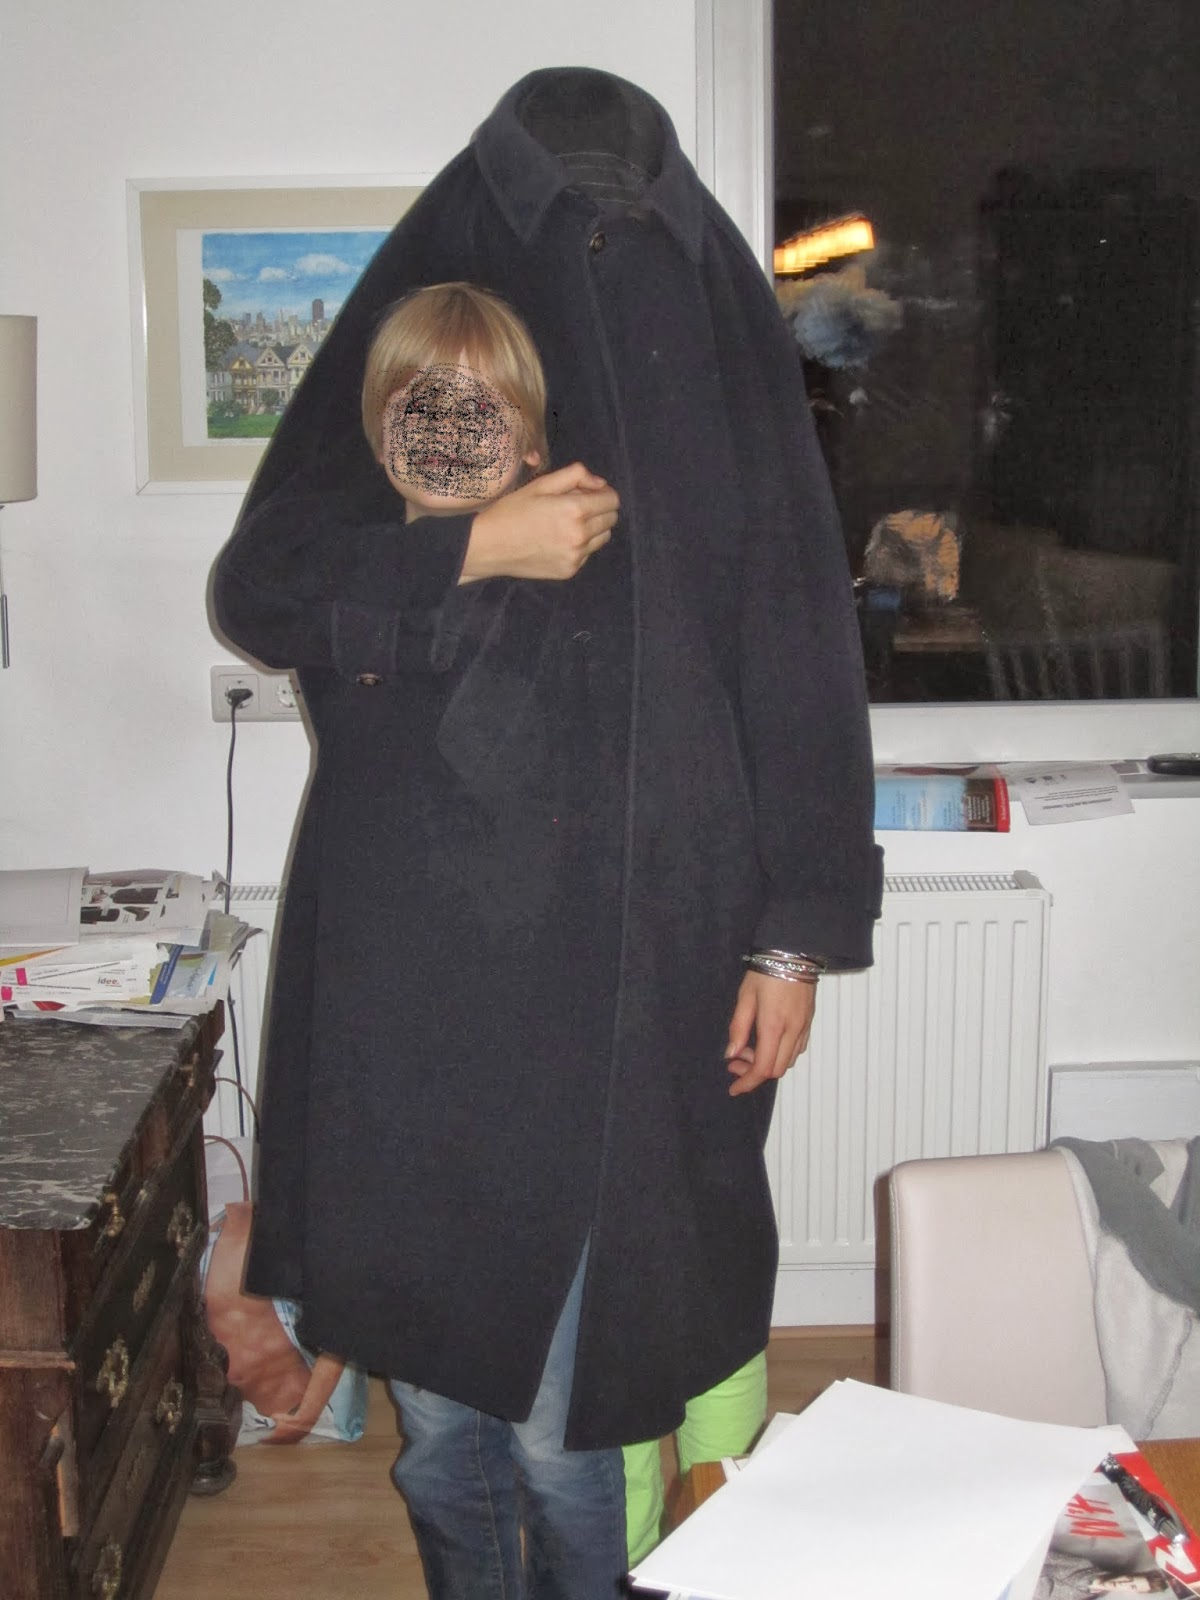 kunst und krams halloween 2012 die kost me. Black Bedroom Furniture Sets. Home Design Ideas